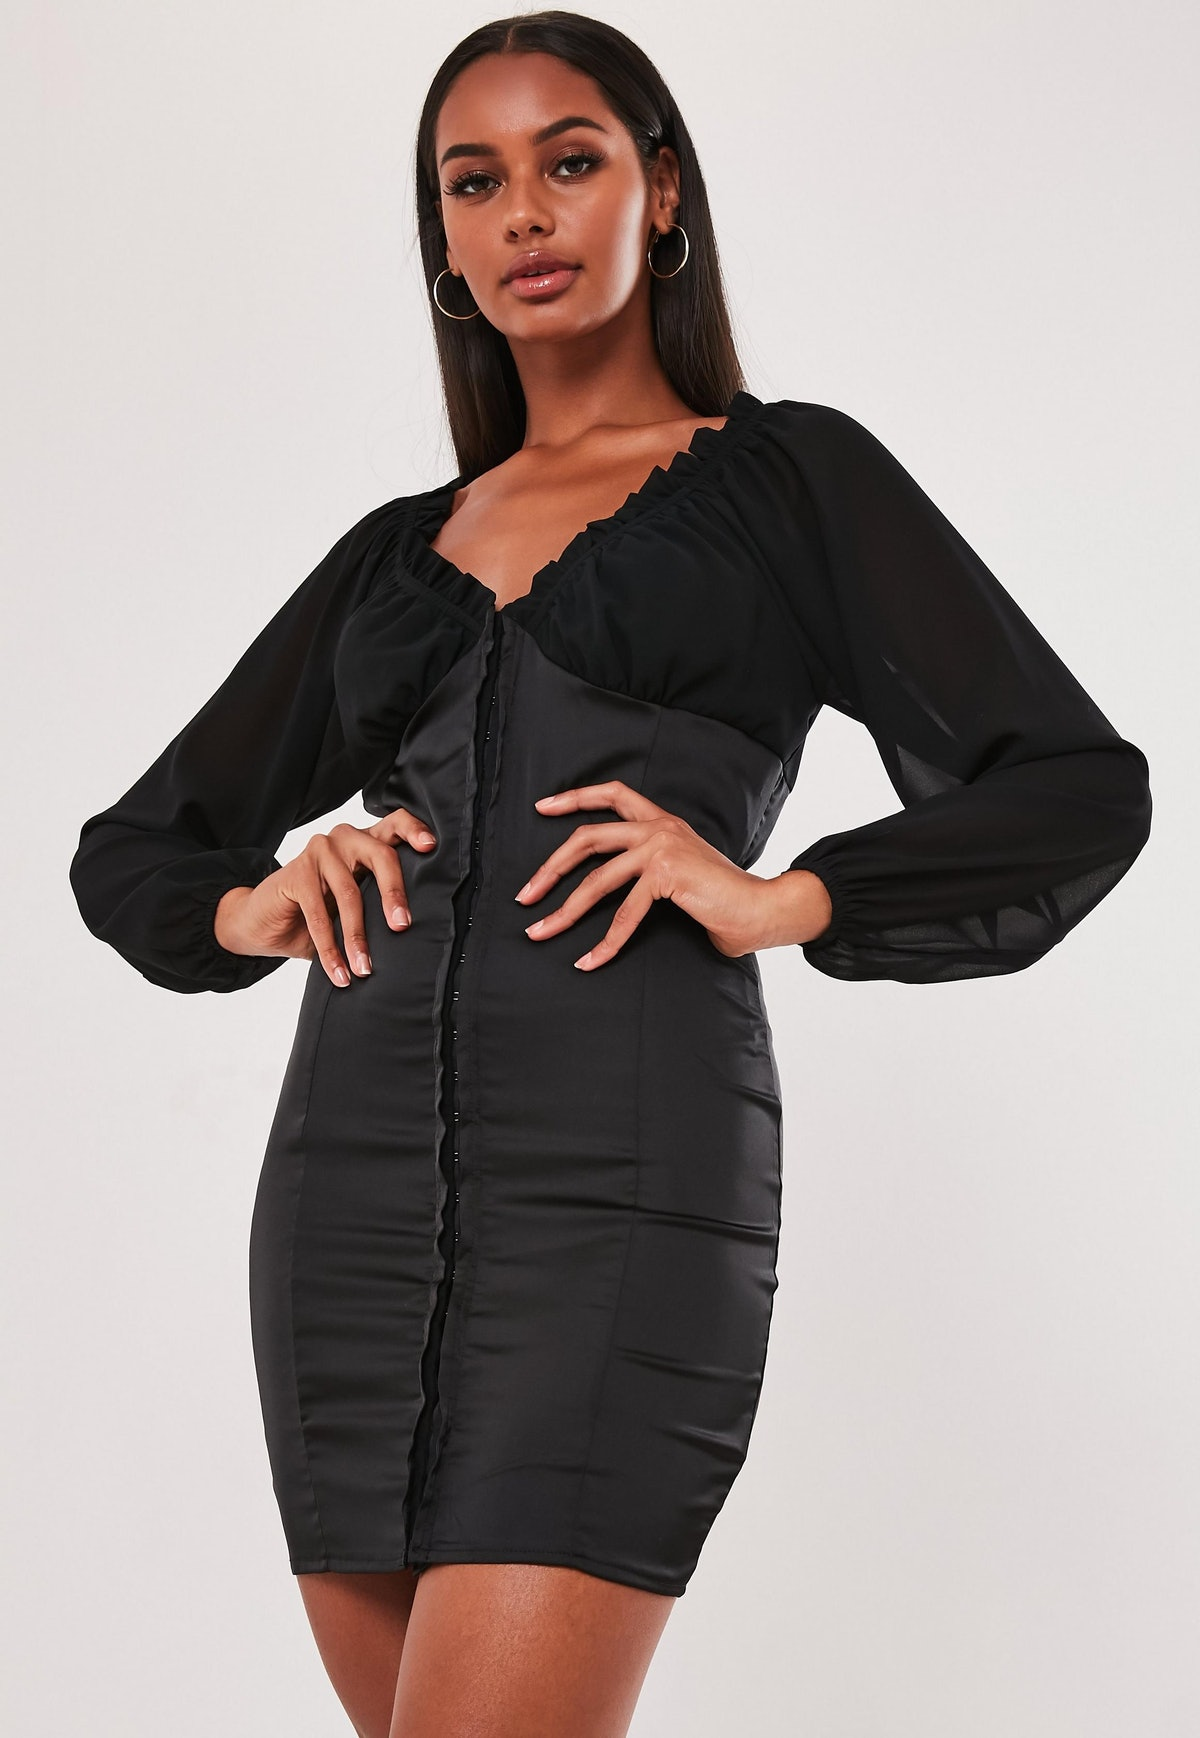 Black Satin Hook & Eye Mini Dress